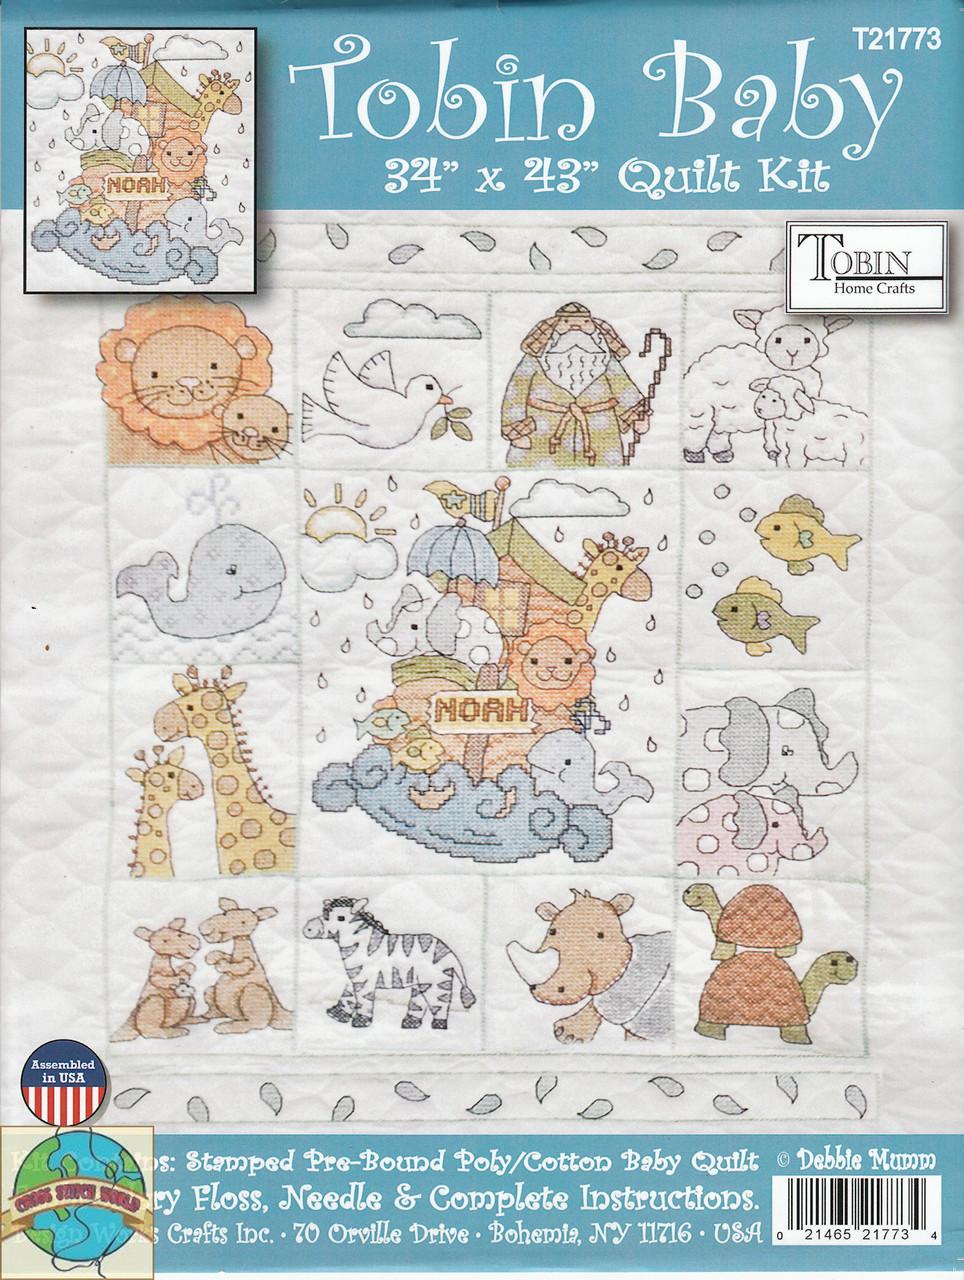 ACHICOO 10PCS White Gauze Square Baby Handkerchief Face Towel for Shower 32x32CM